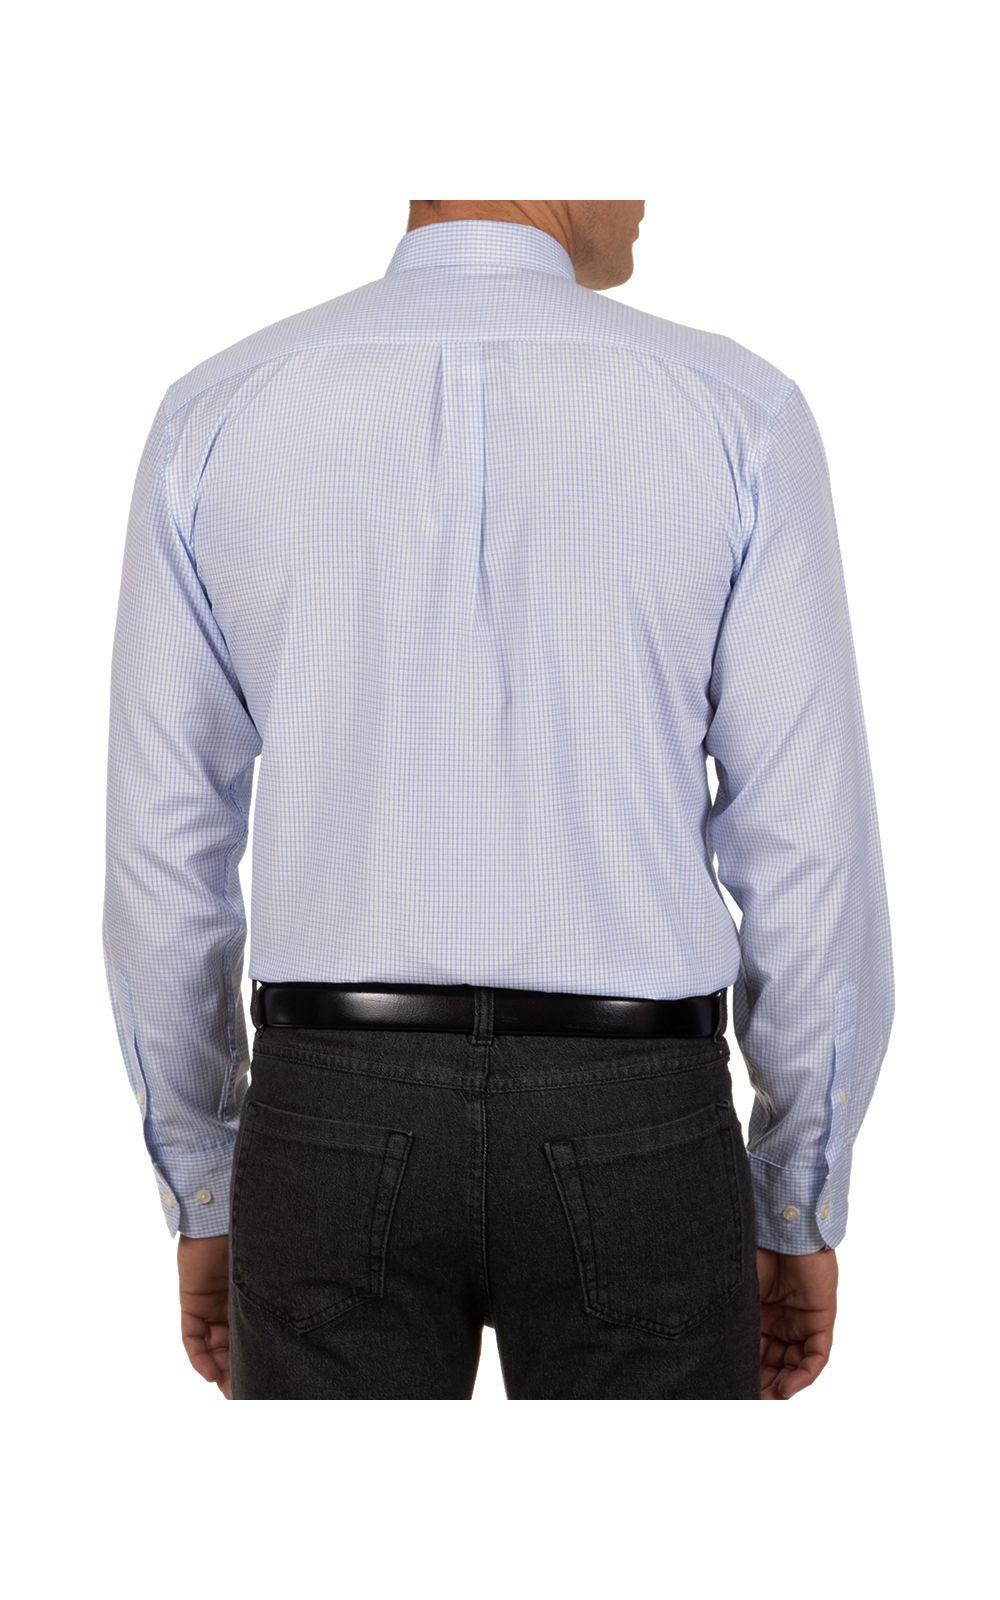 Foto 2 - Camisa Social Masculina Azul Claro Xadrez